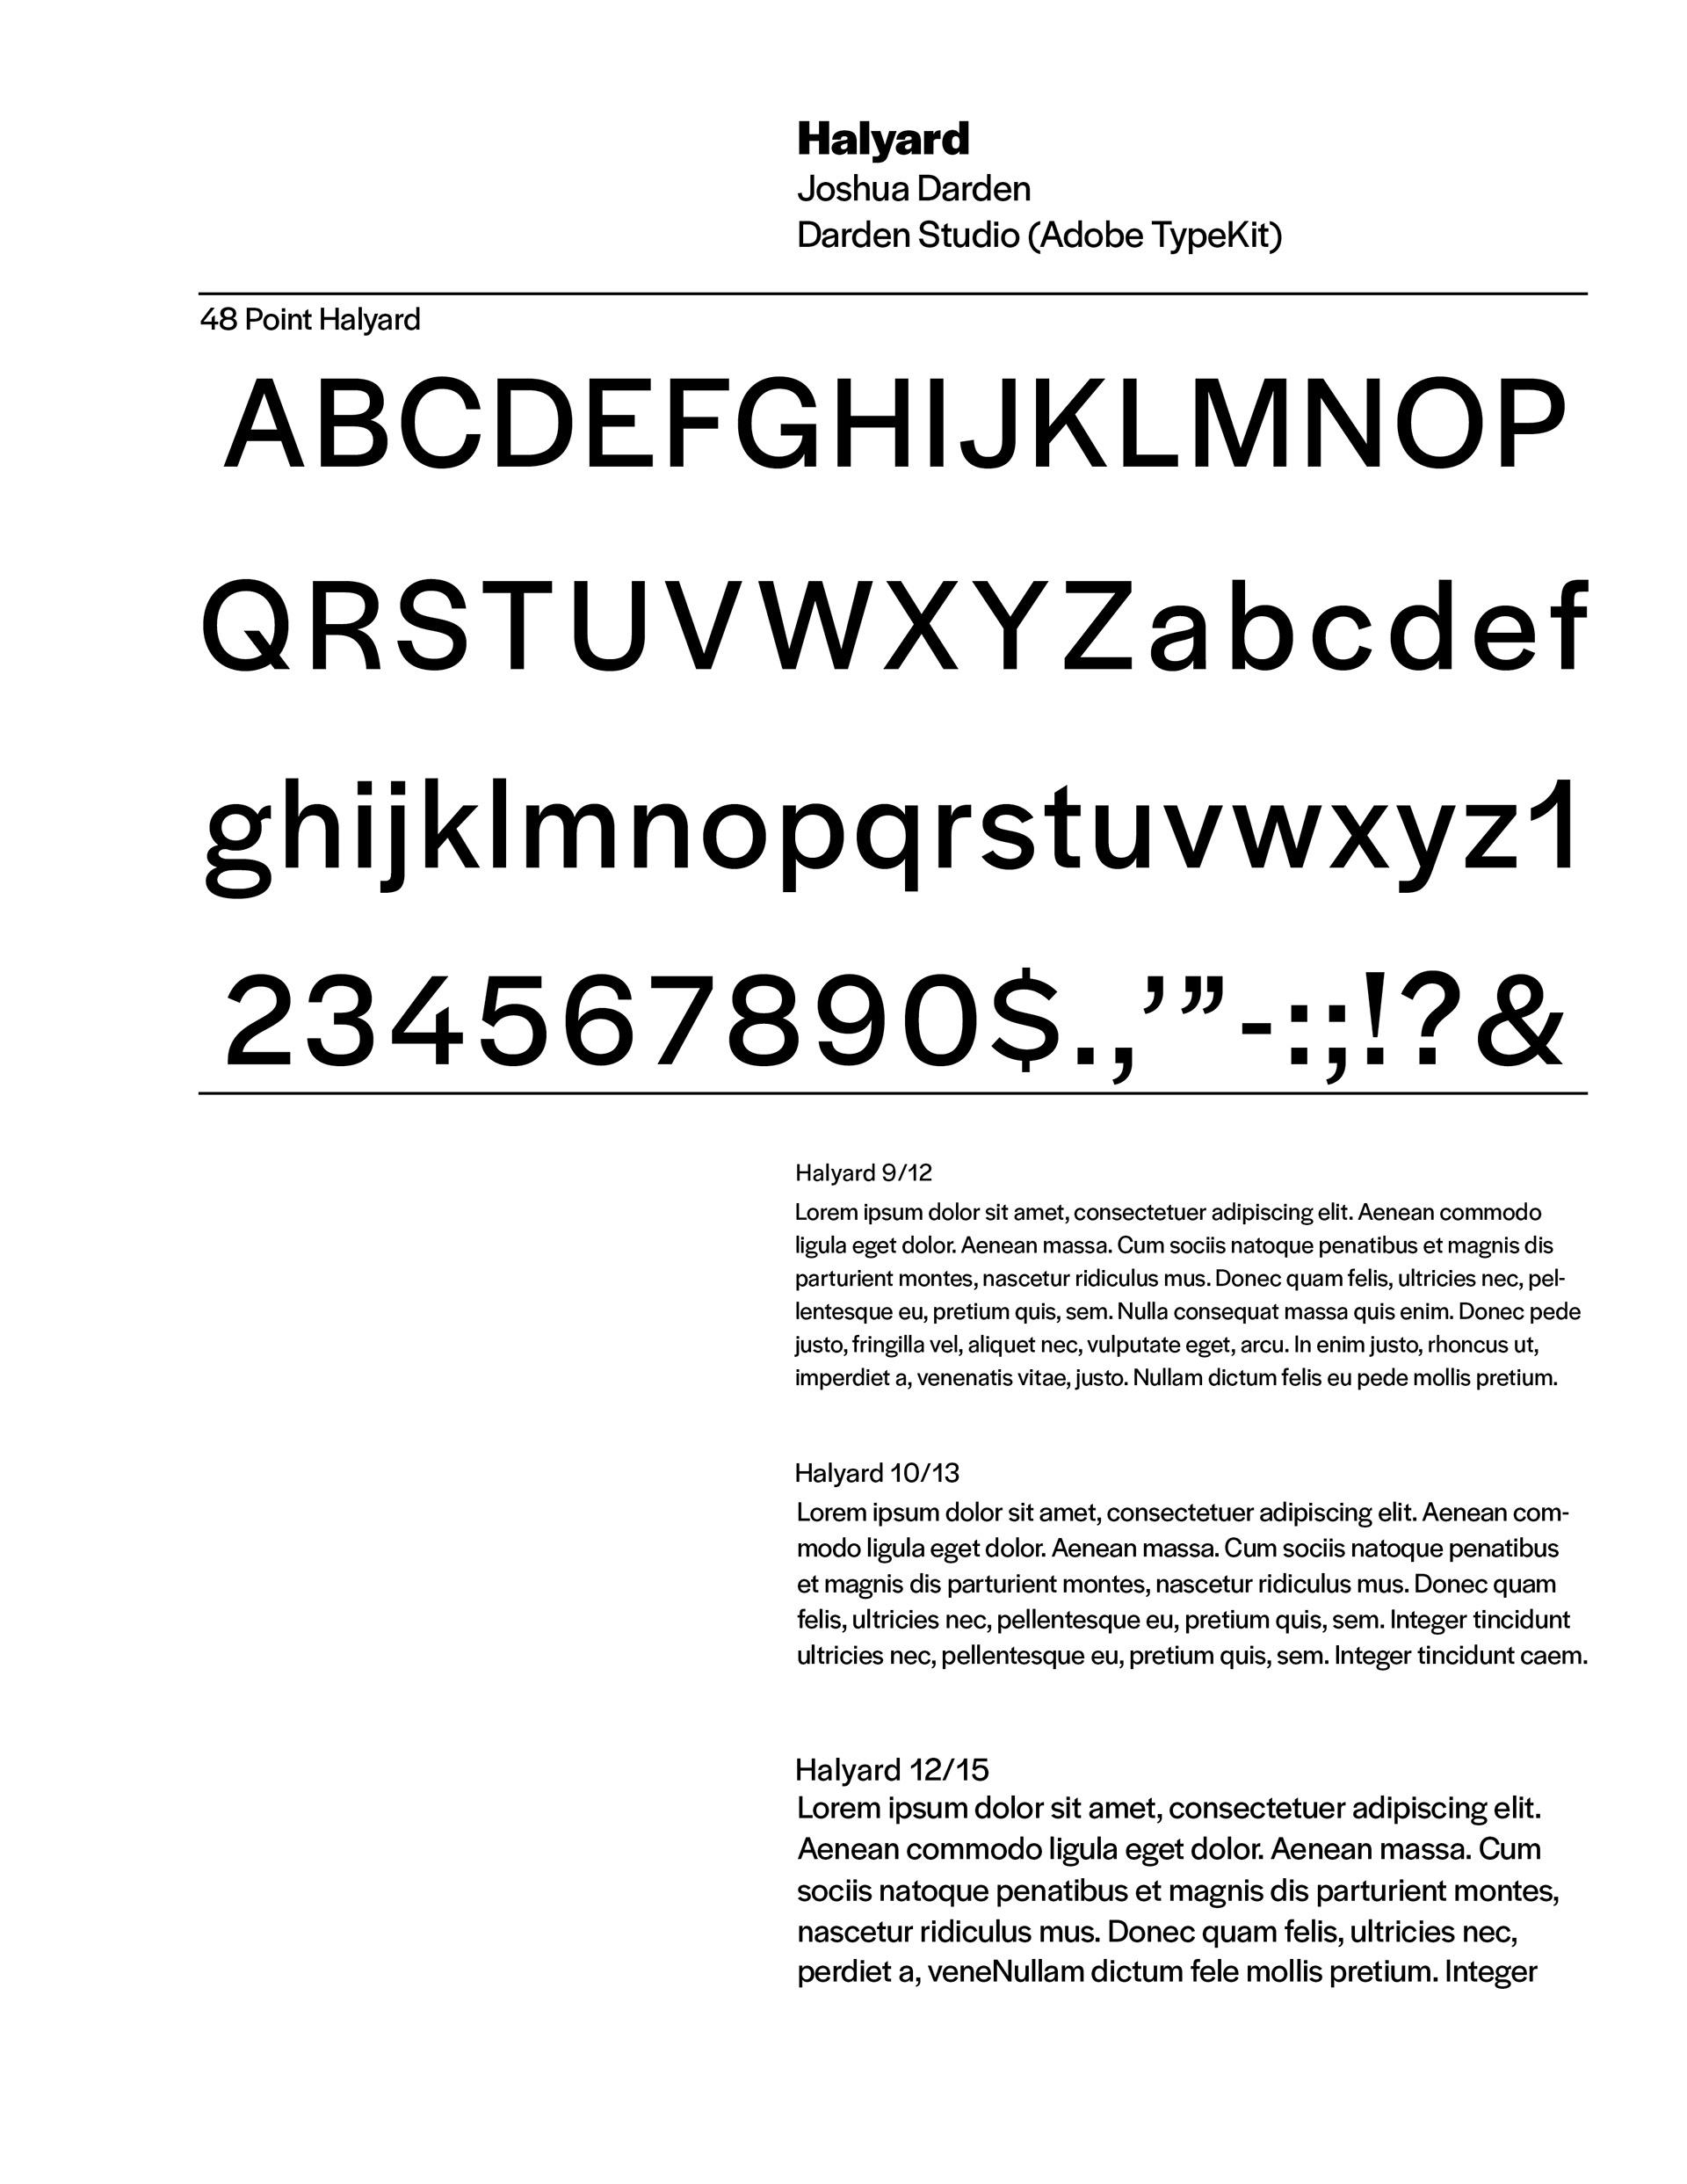 Margaret Sheridan - Typography